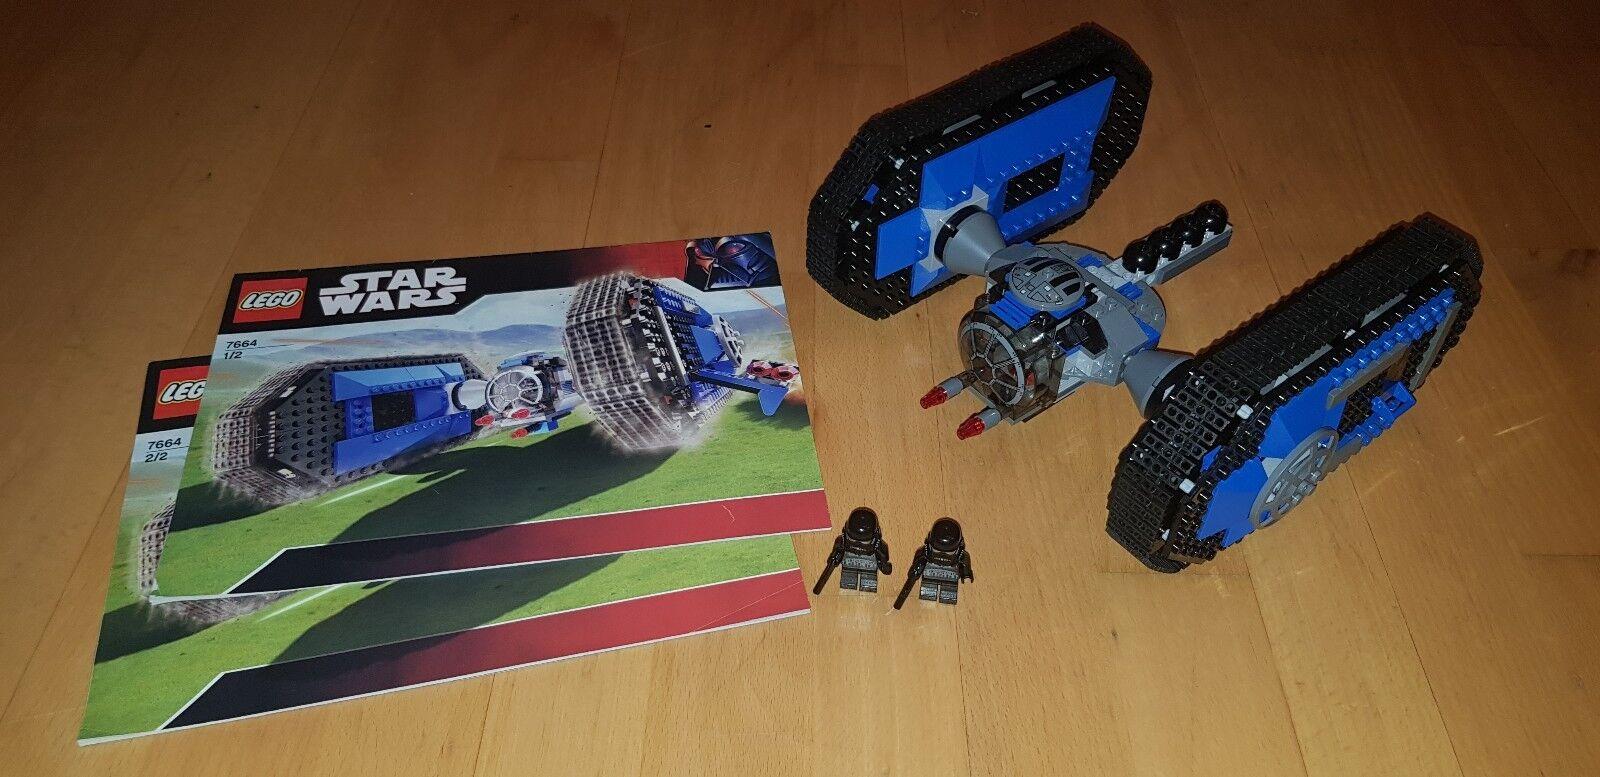 Lego Star Wars 7664 - TIE Crawler